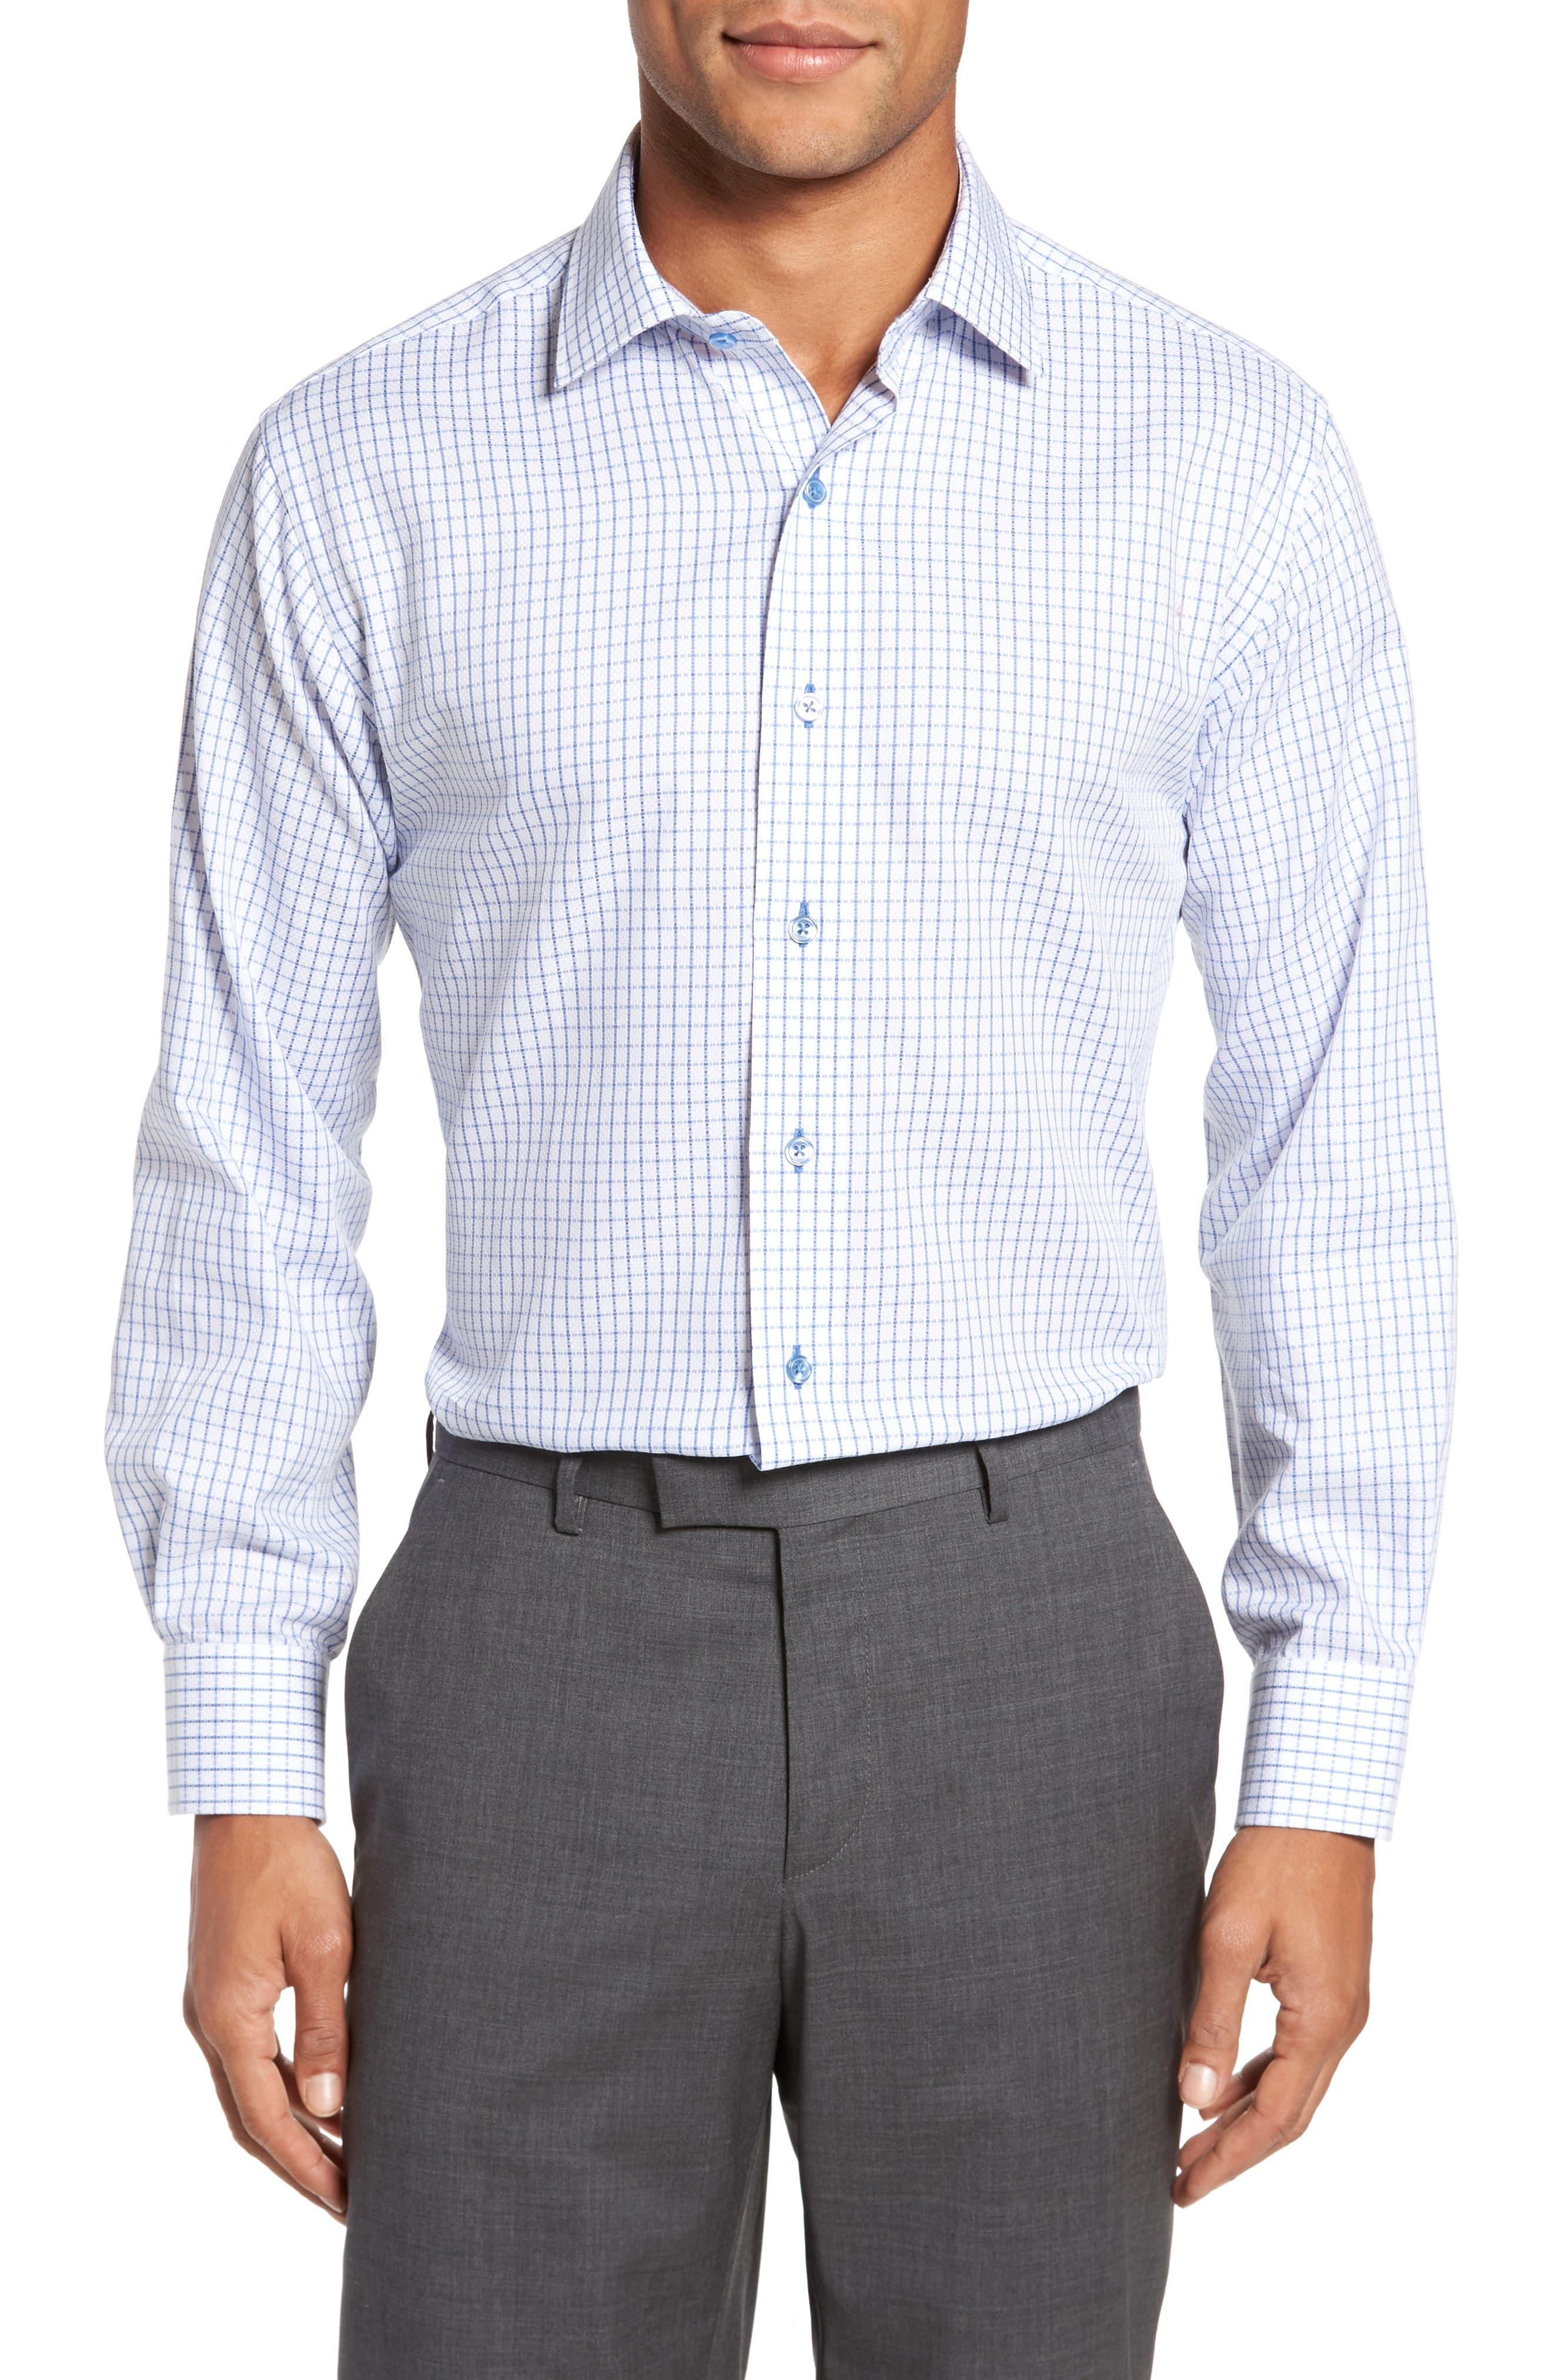 Trim Fit Textured Check Dress Shirt,                         Main,                         color, LIGHT BLUE